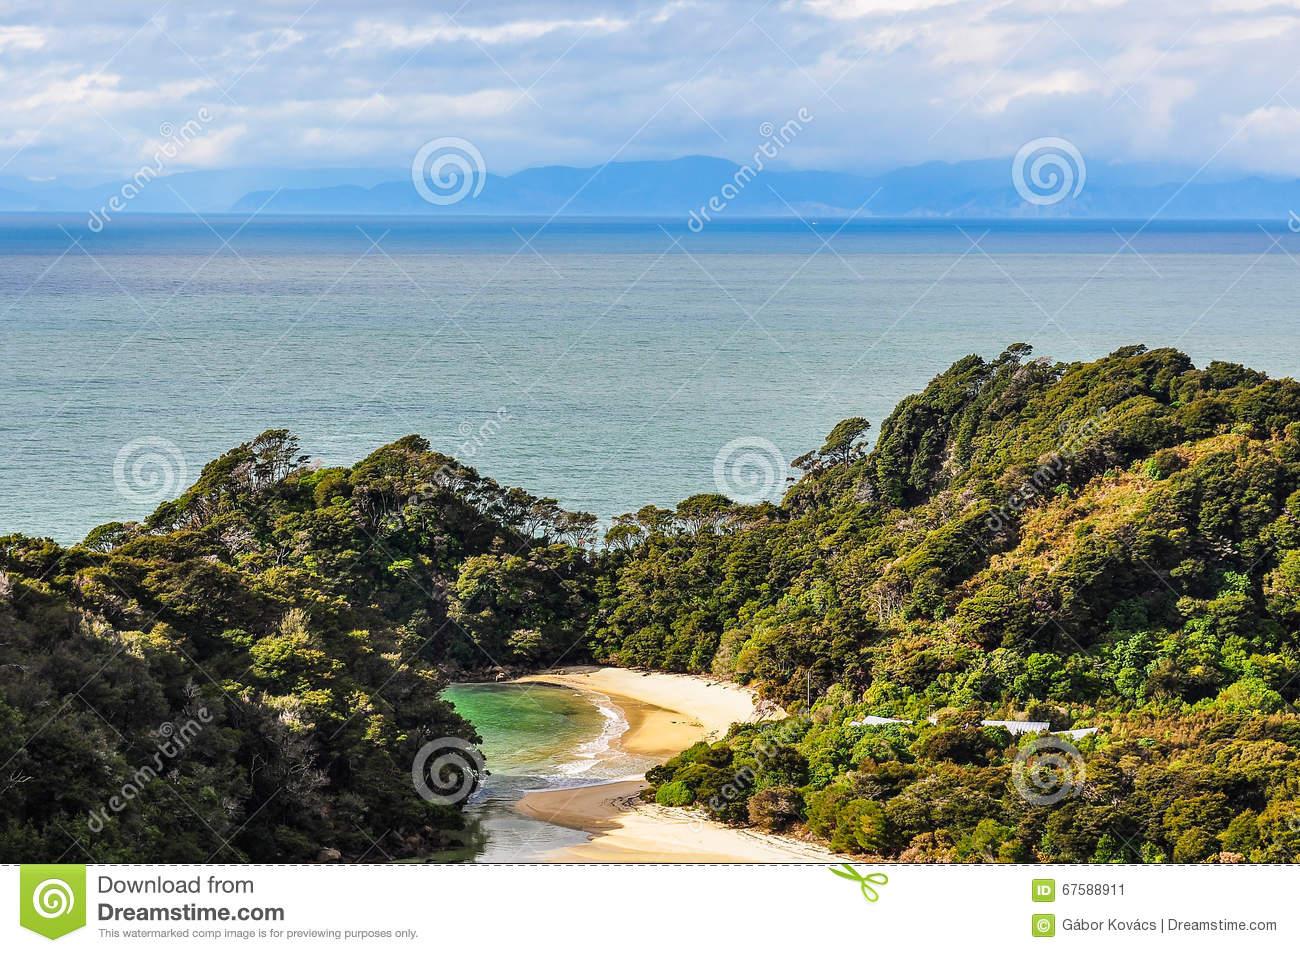 Abel tasman national park clipart #14